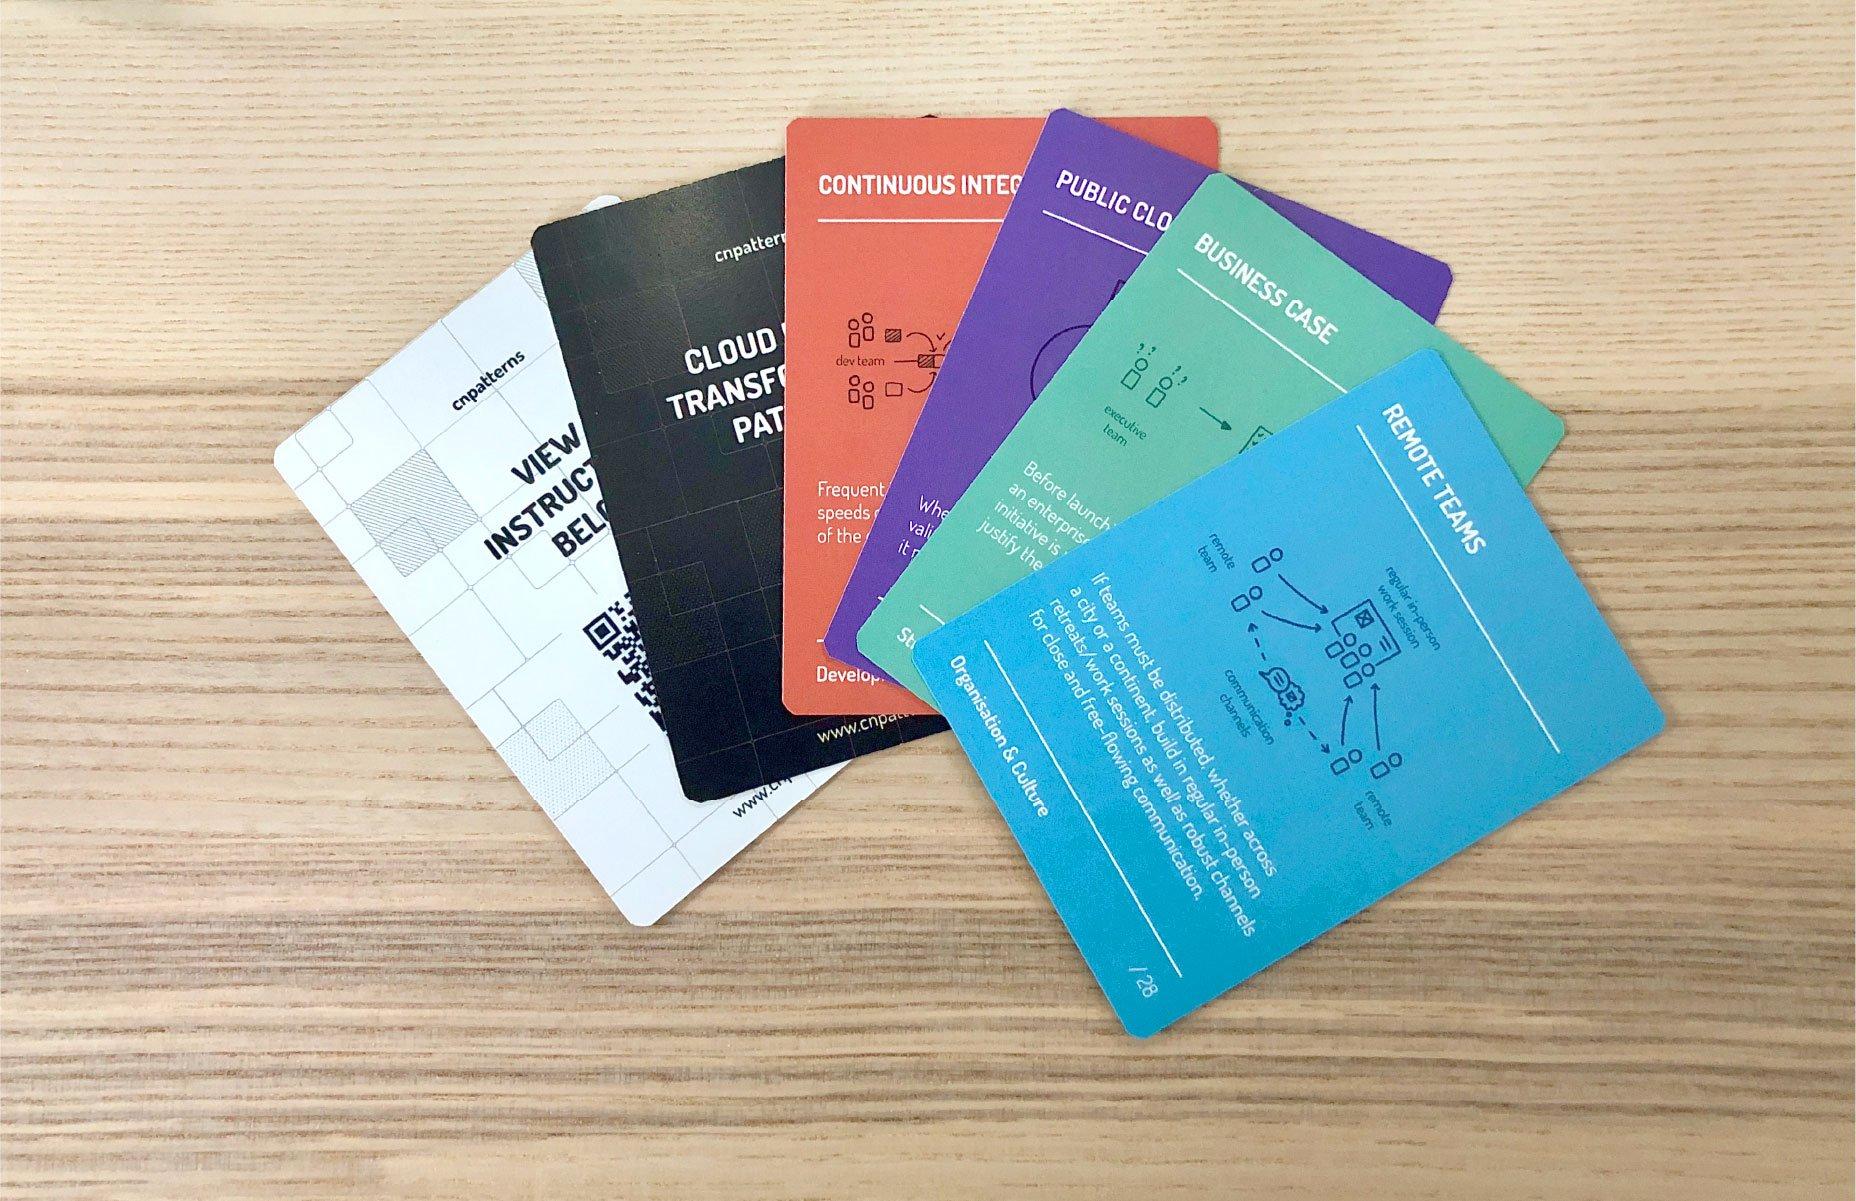 cnt-cardsworkshop-copy